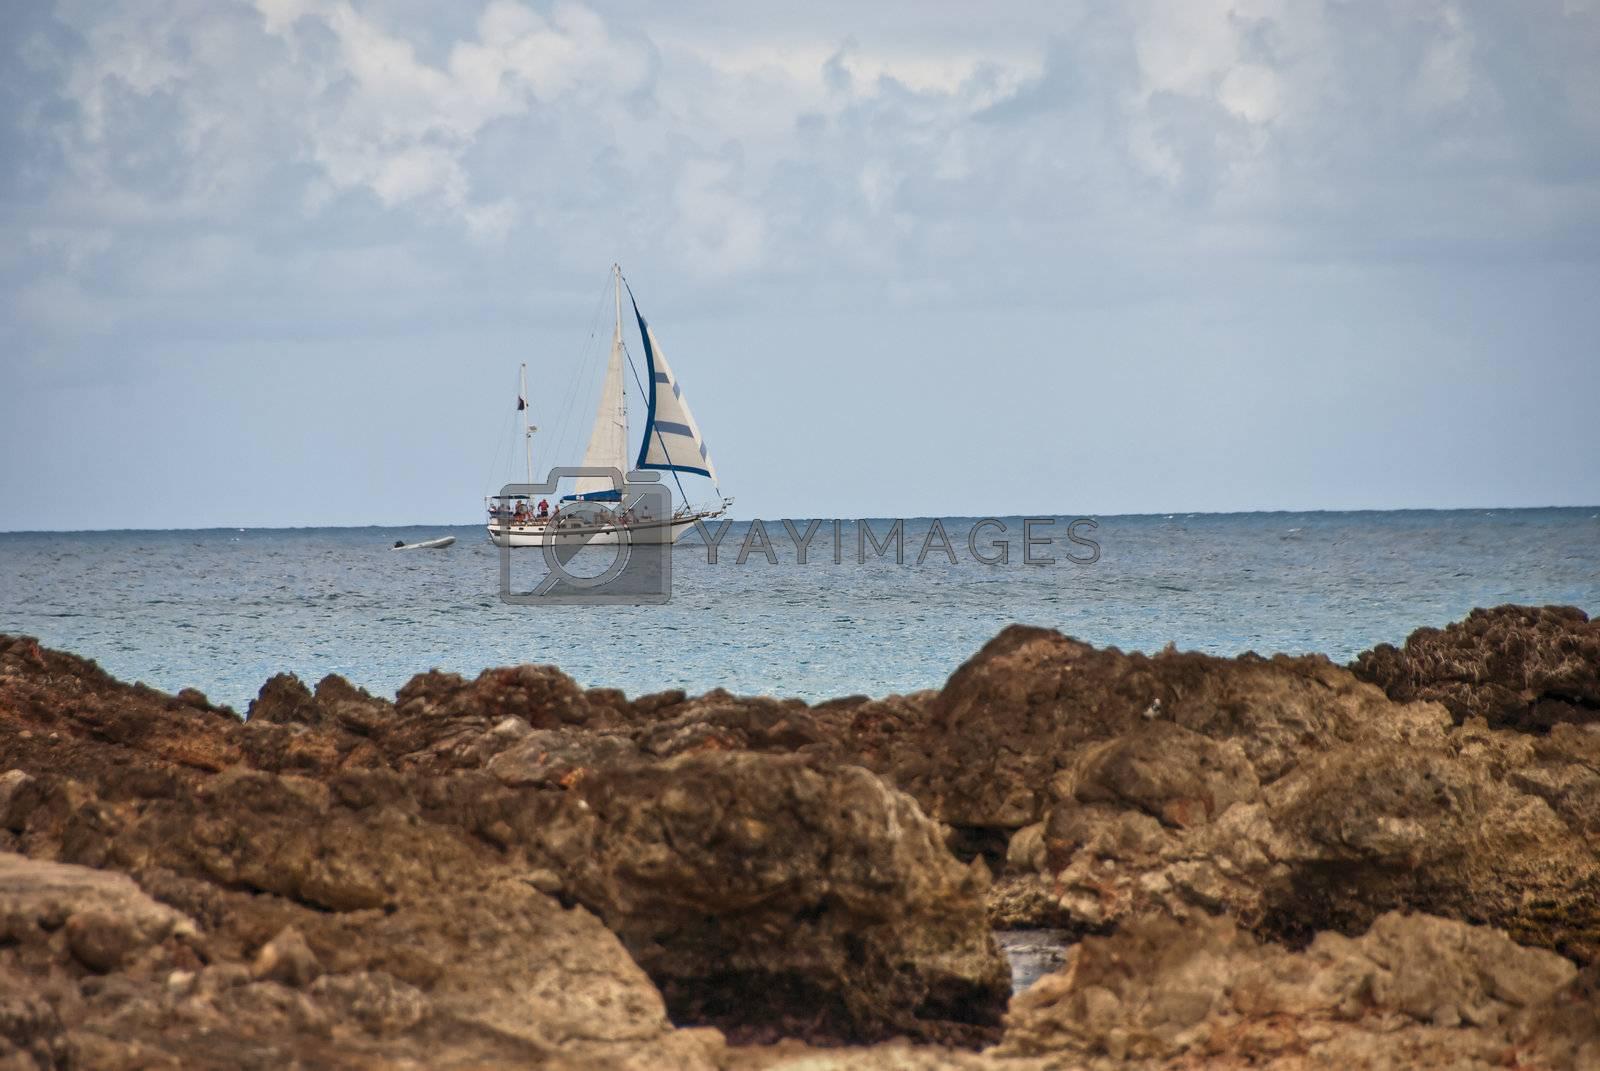 Saint Maarten Coast, Dutch Antilles by jovannig